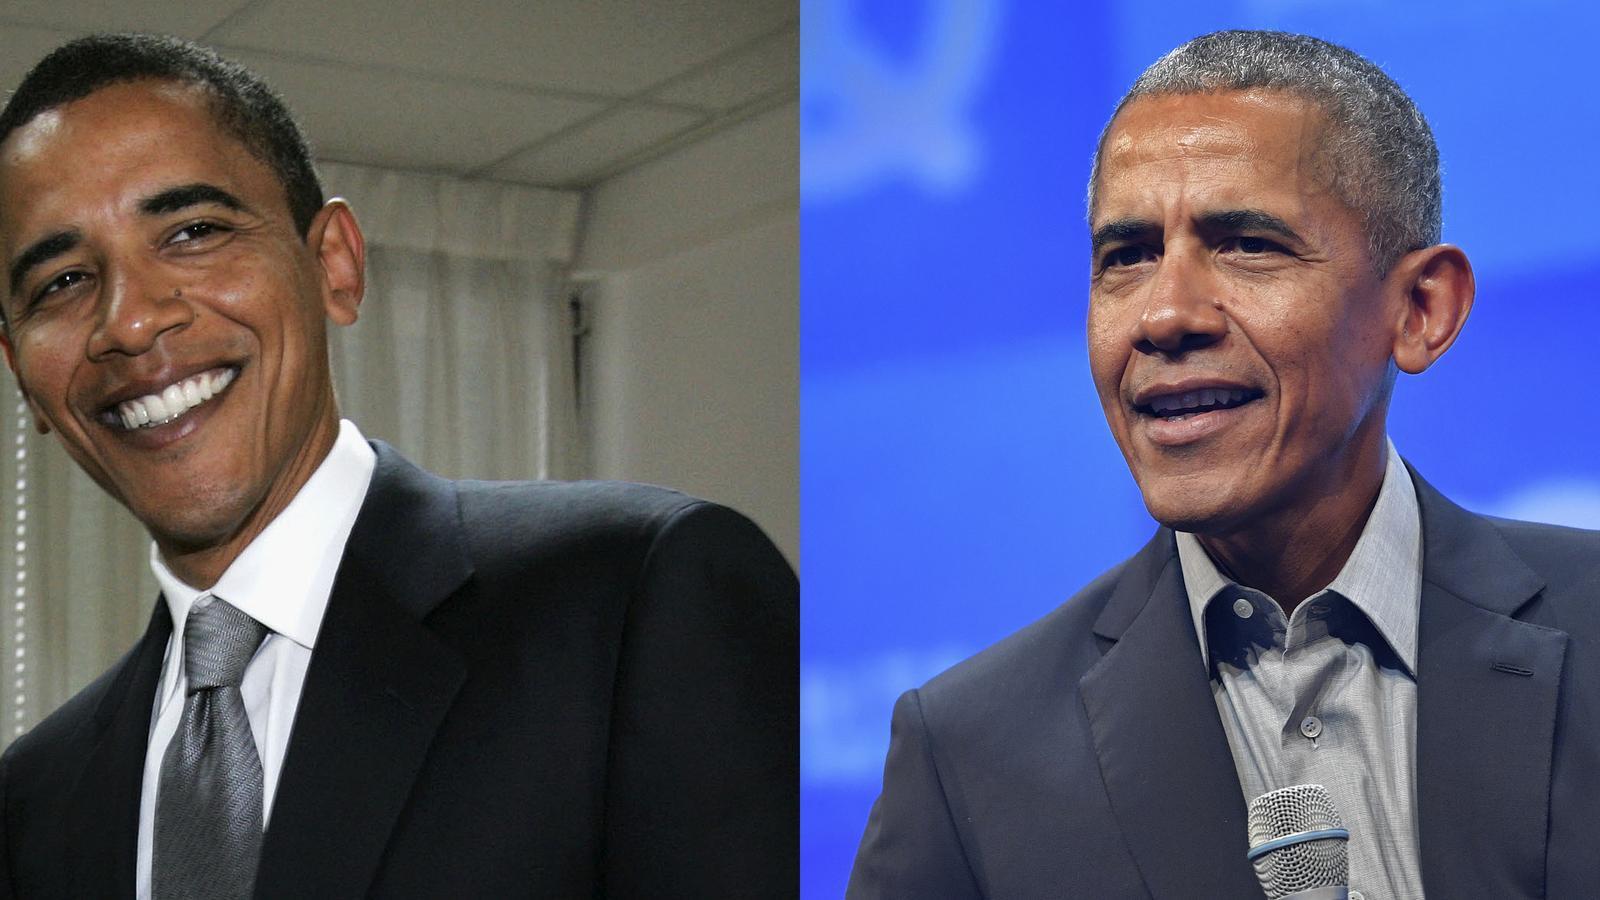 L'expresident Obama, sense i amb canes